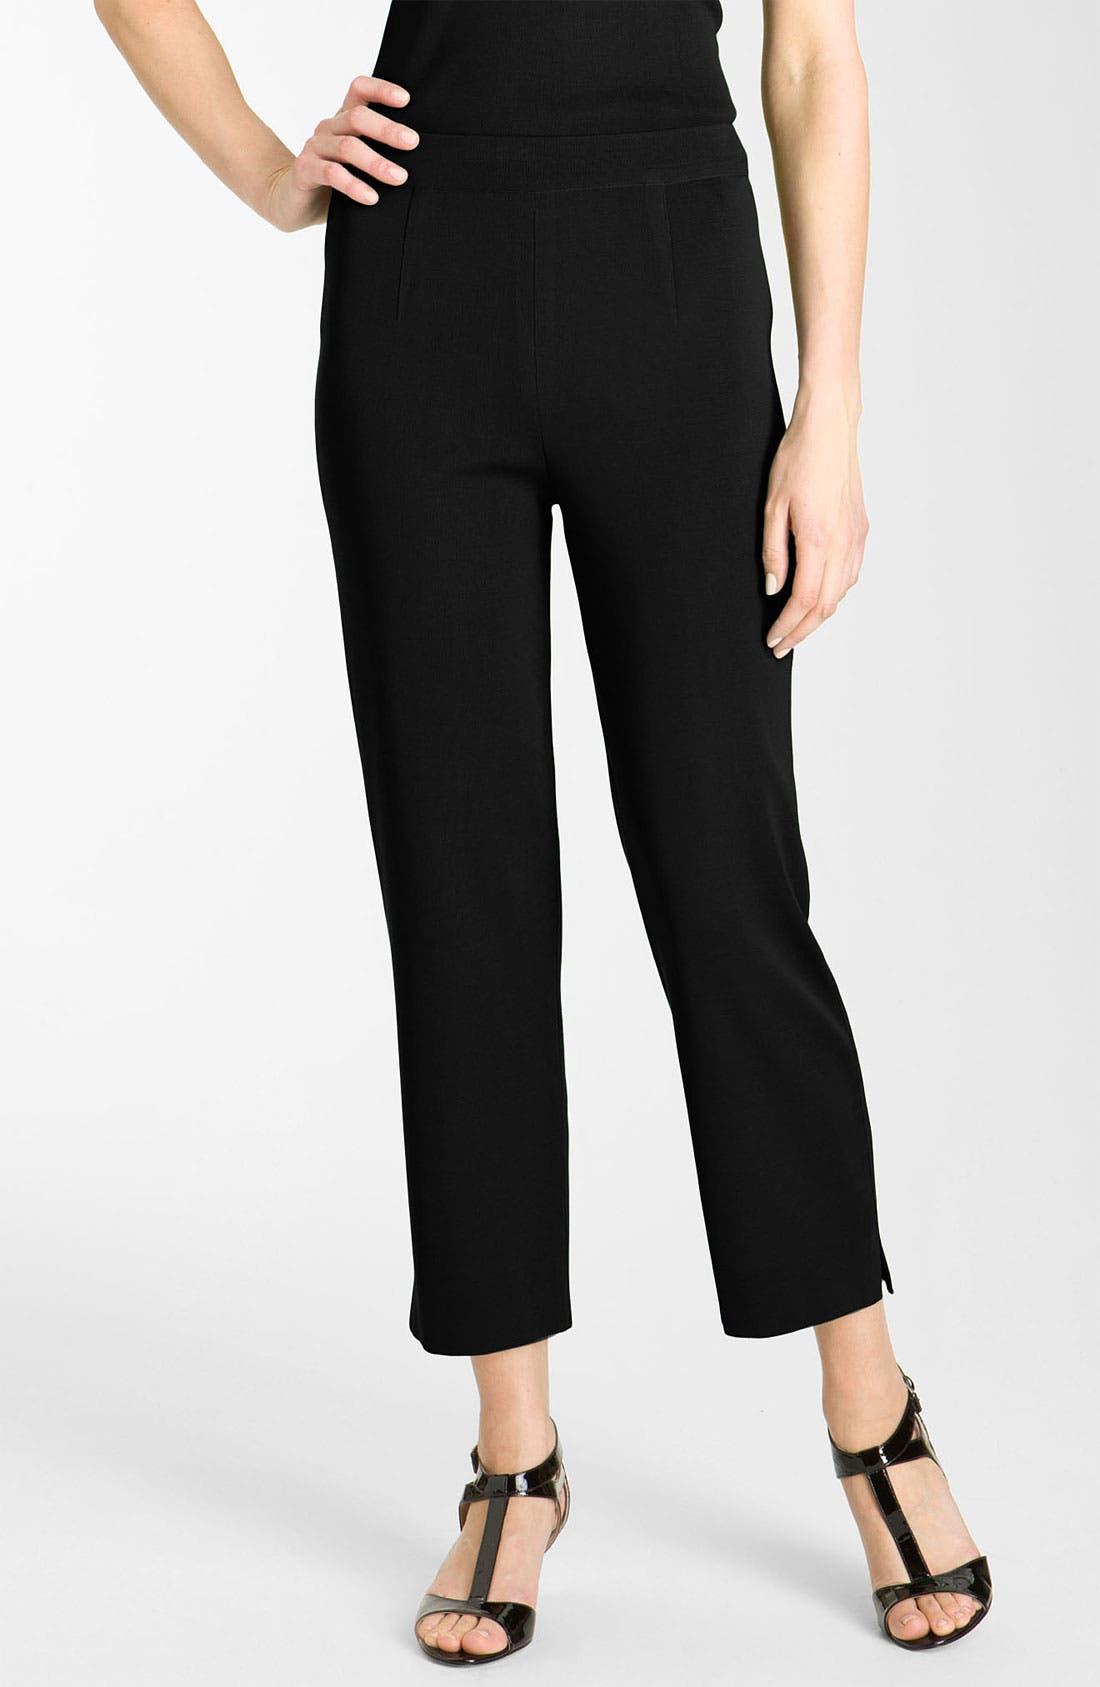 Alternate Image 1 Selected - Misook Capri Pants